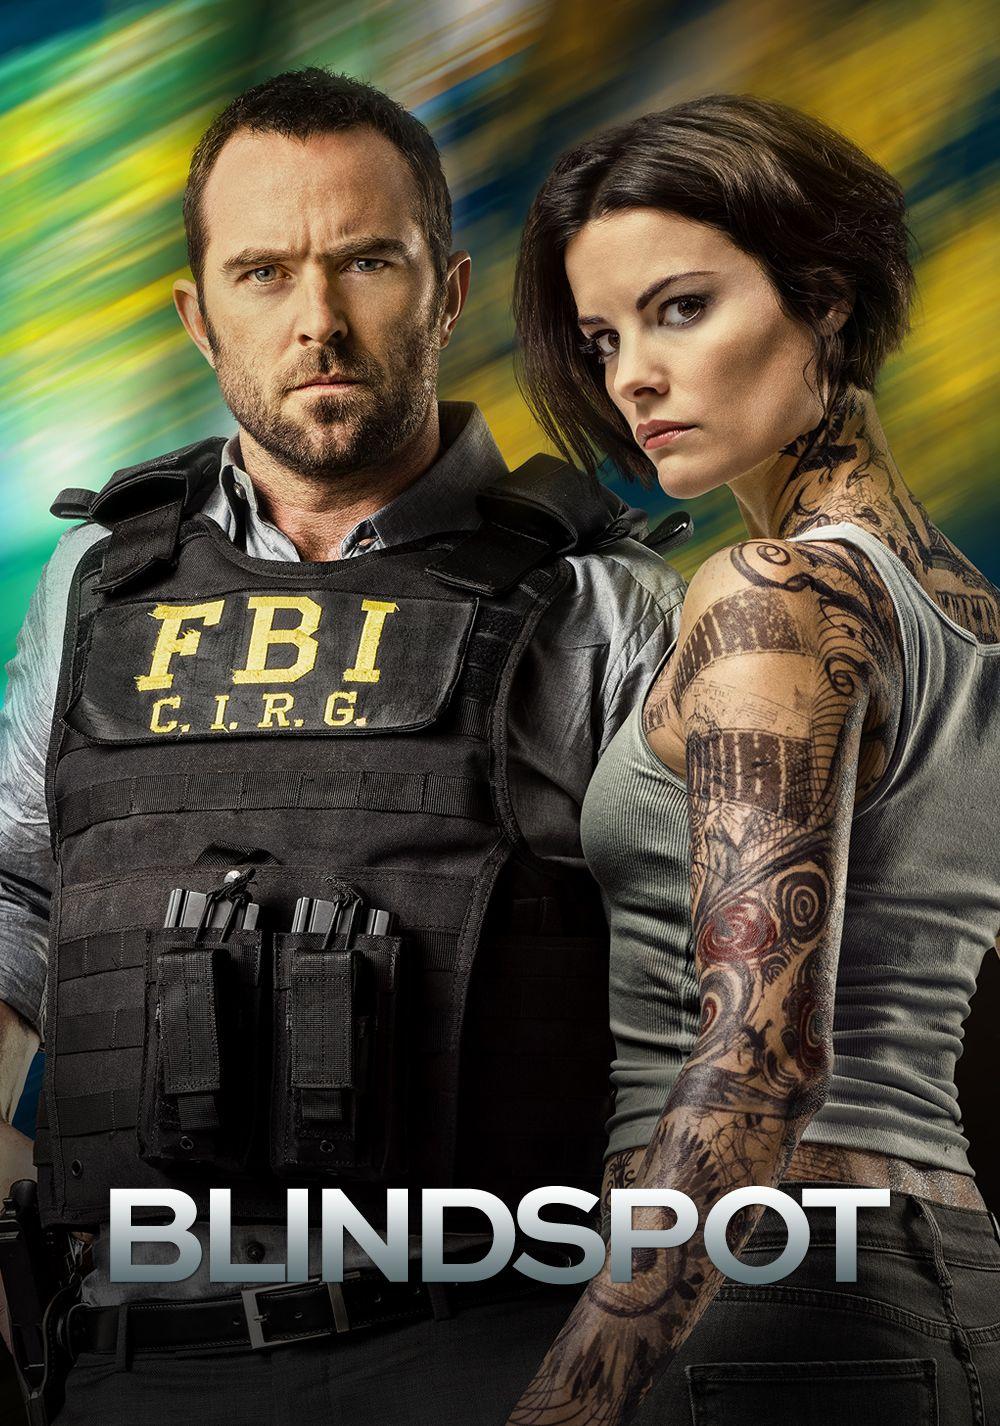 blindspot season 3 cast blake